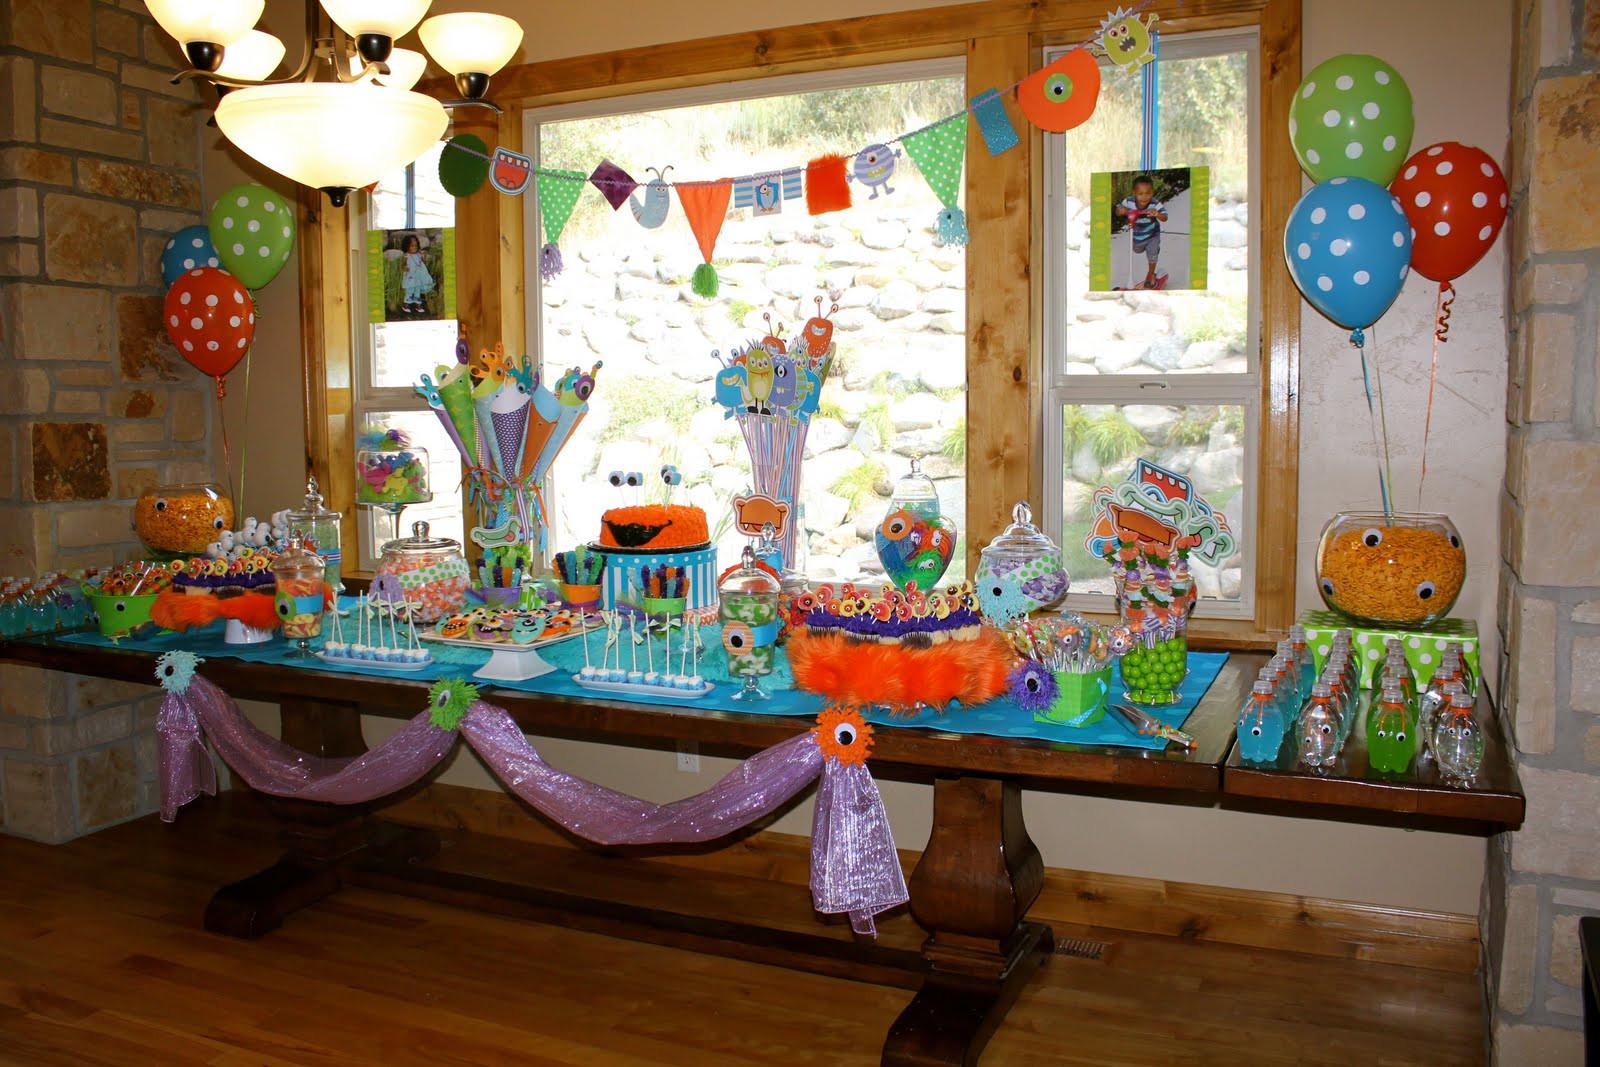 Monster Birthday Party Decorations  Bridgey Widgey Monster Birthday Party